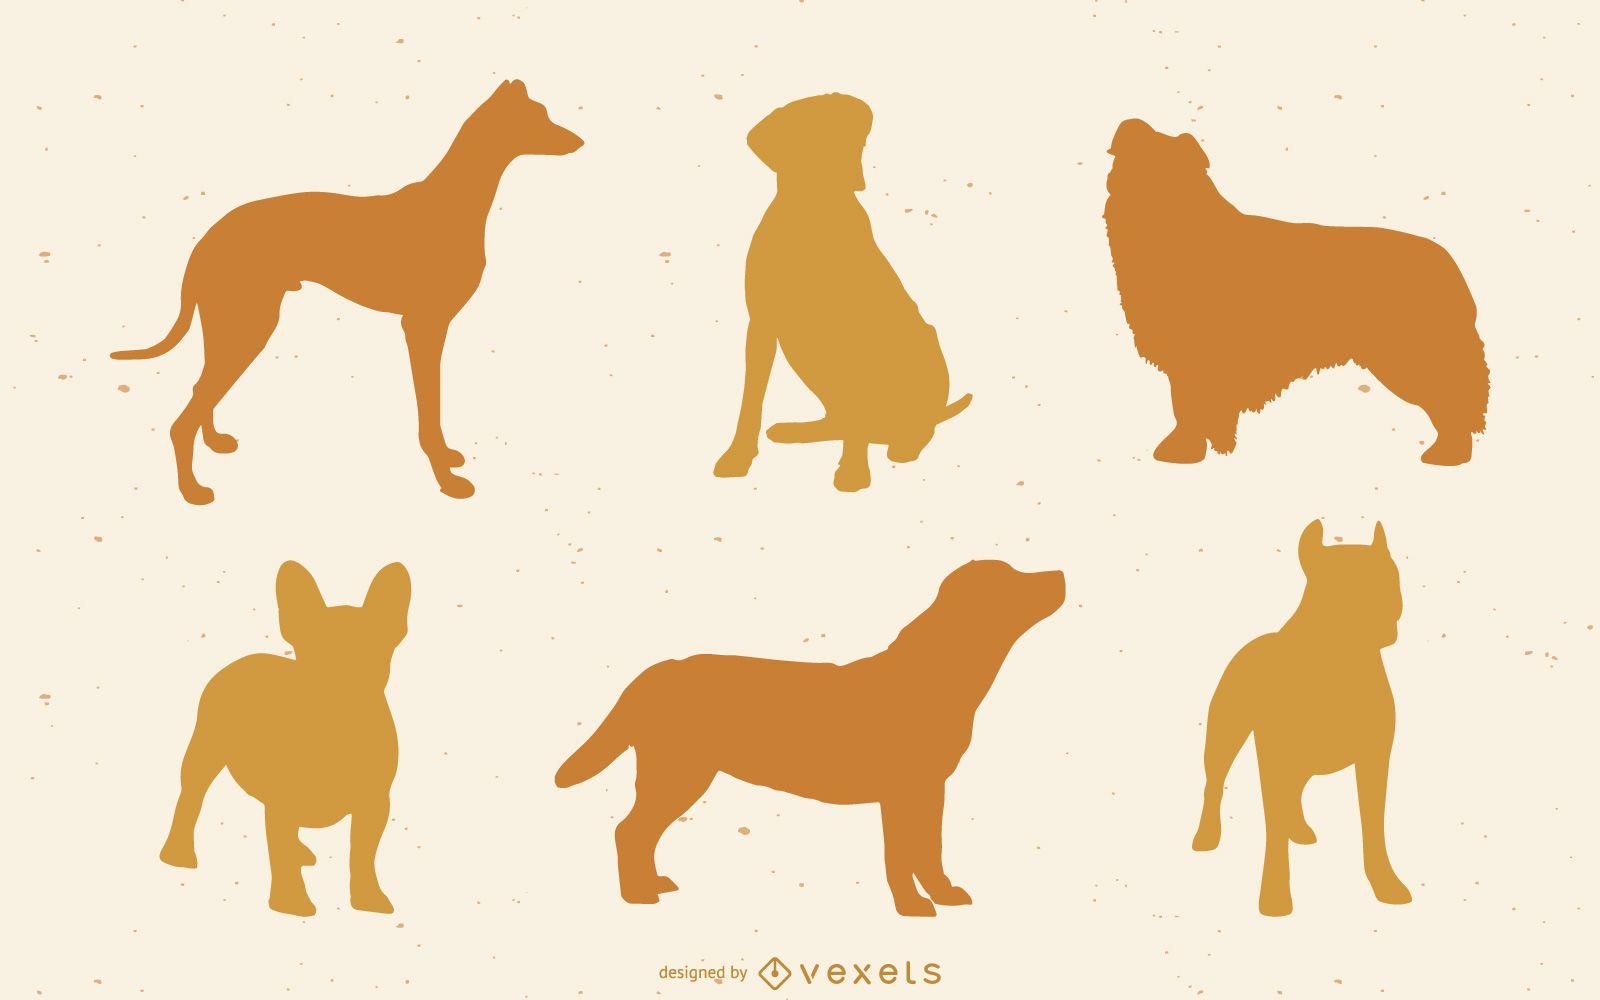 Hund Silhouette Vektor Pack